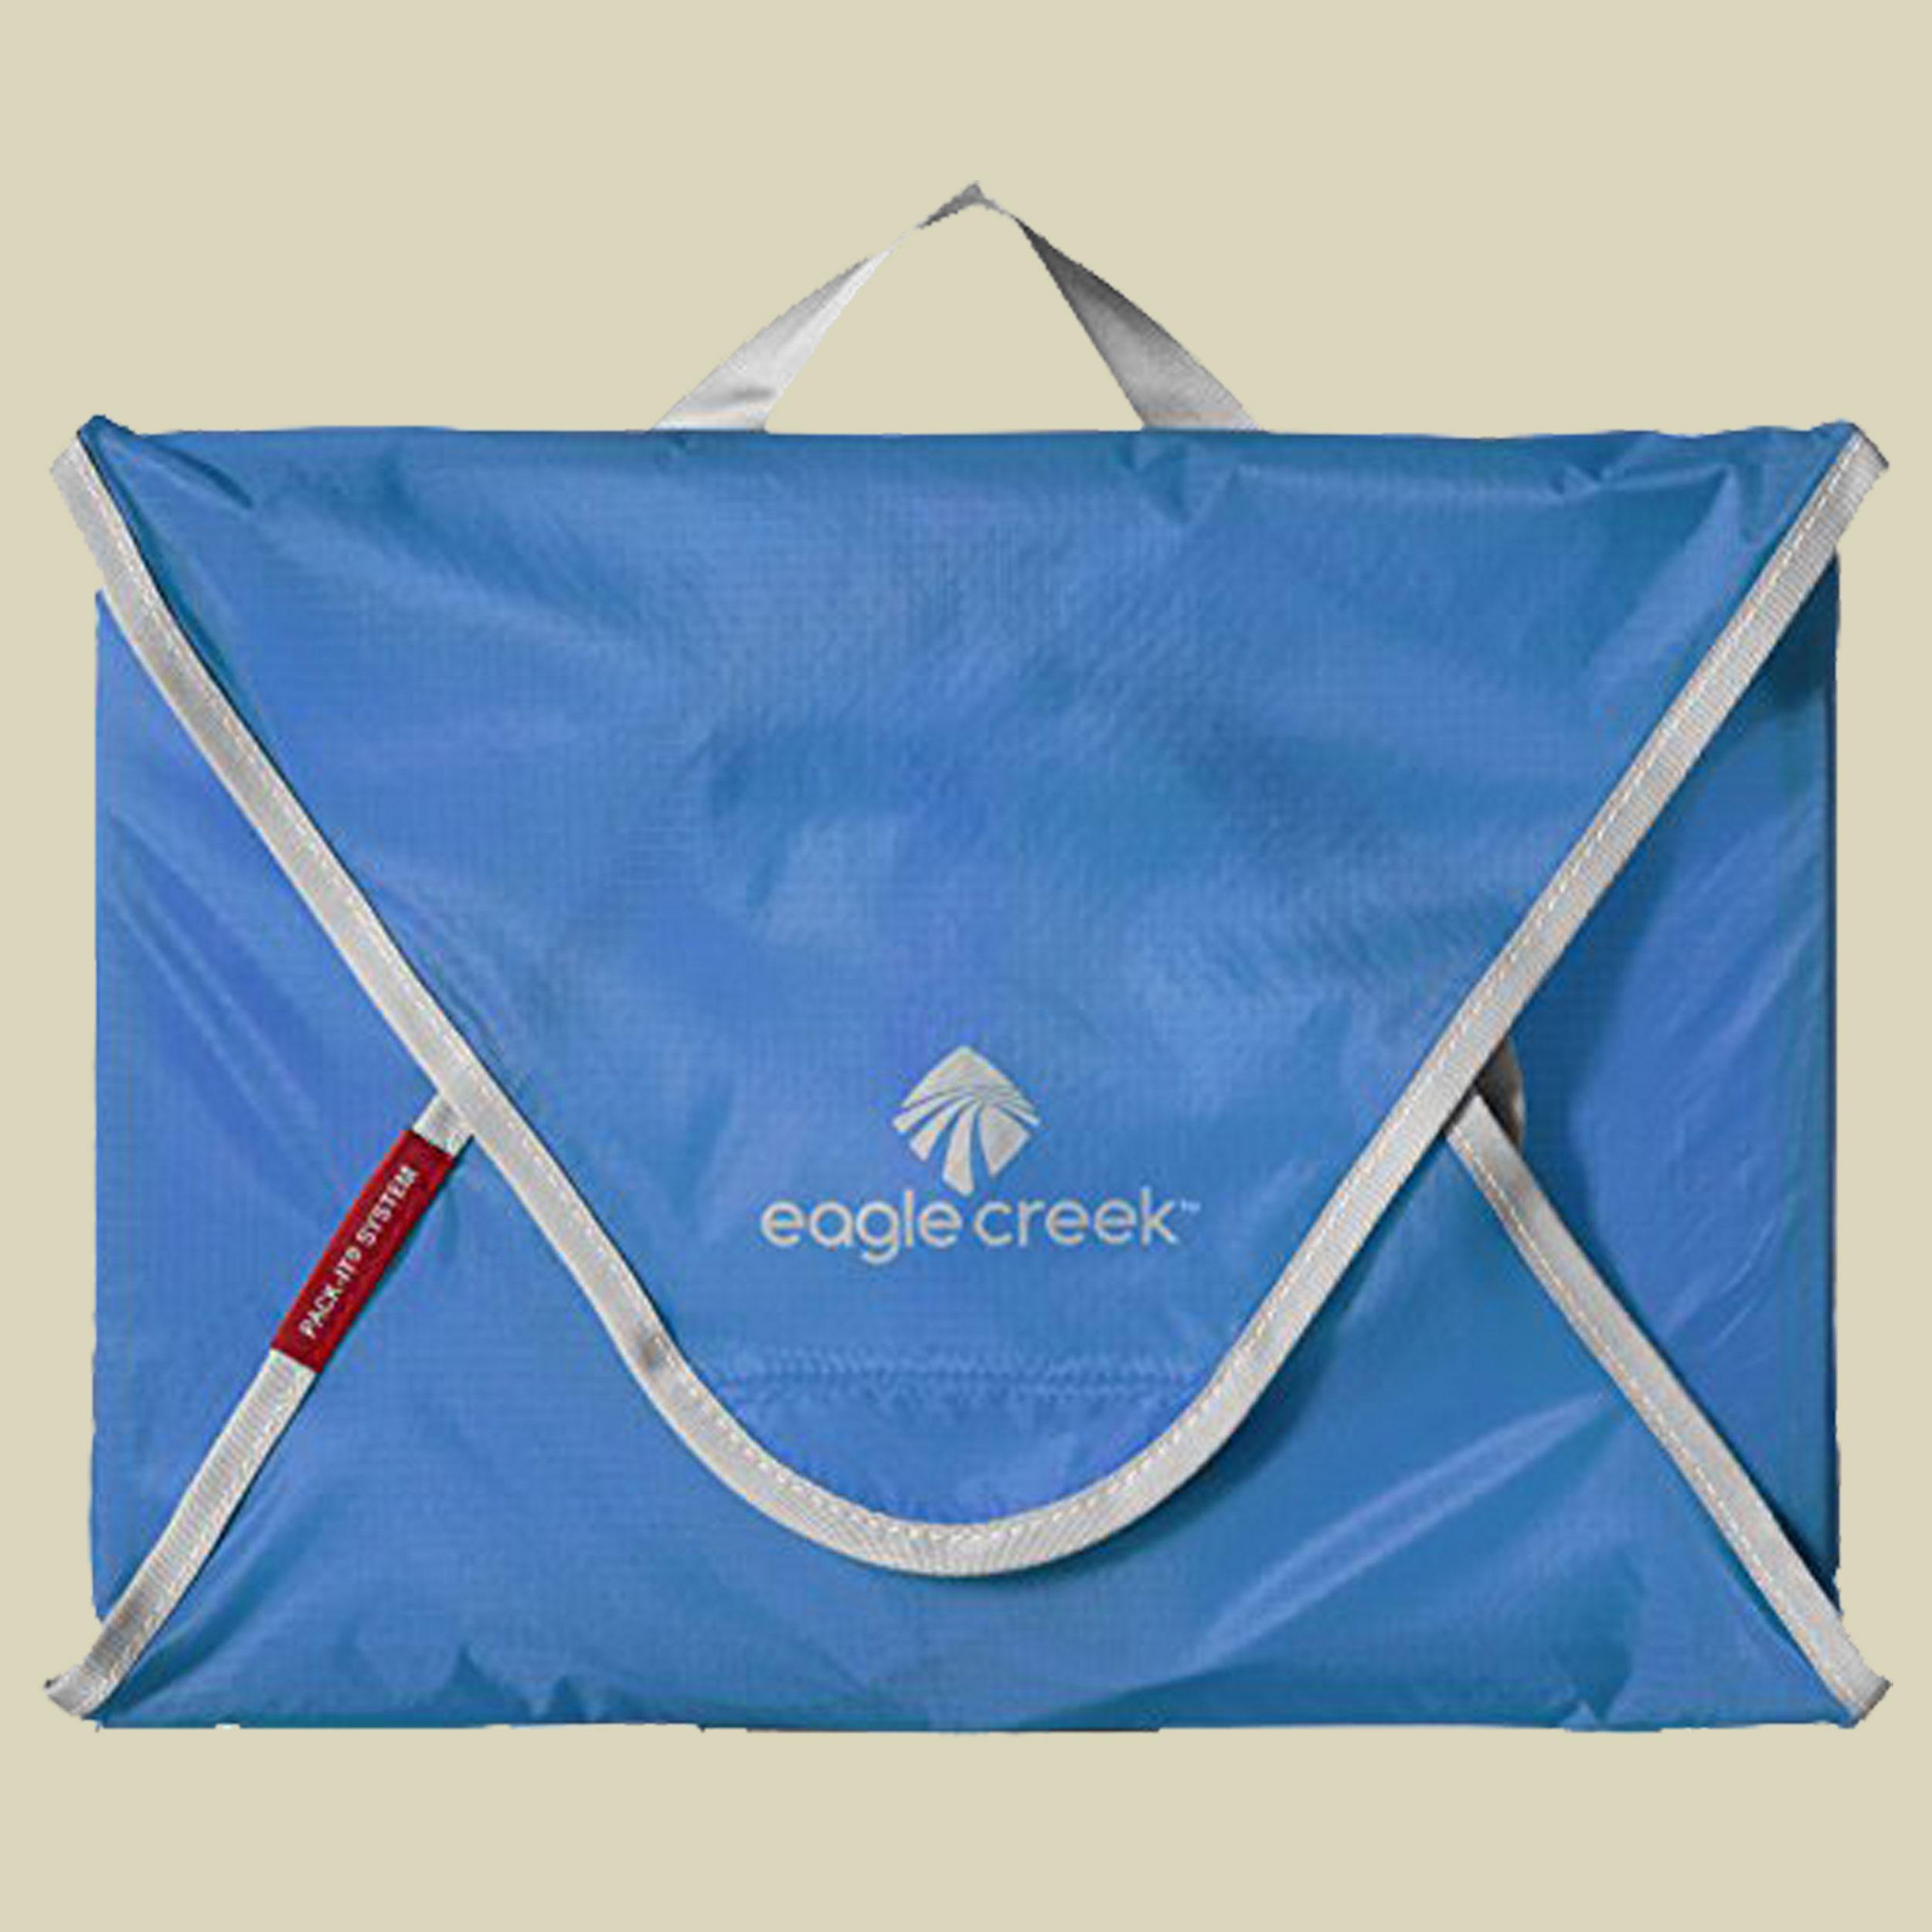 Eagle Creek Pack-It Specter Garment Folder Packsack für Kleidung Größe small brilliant blue